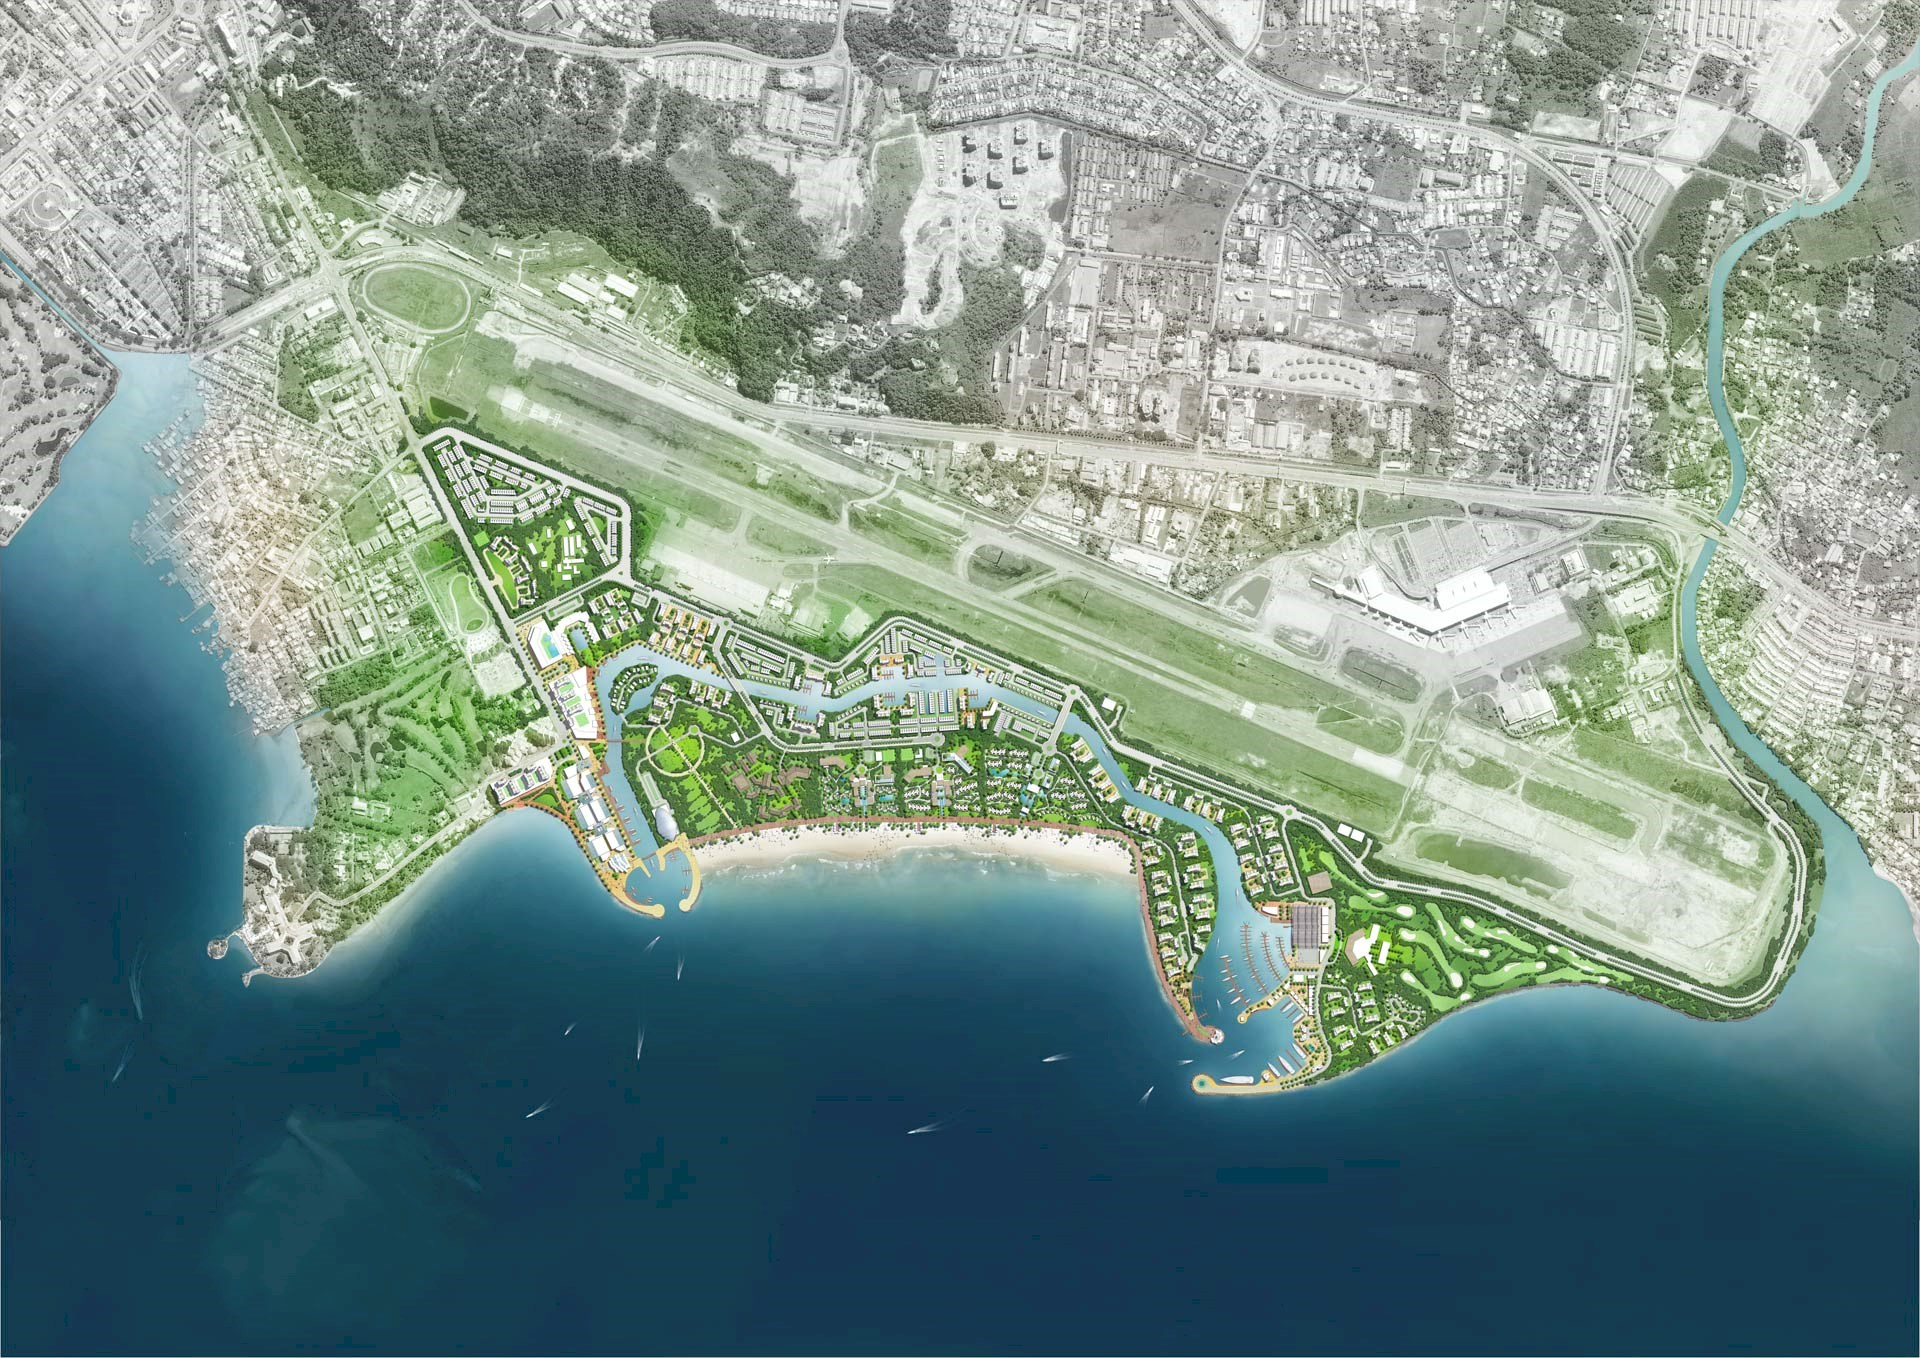 Benoy's Tanjung Aru Eco Development is Set to Transform Kota Kinabalu